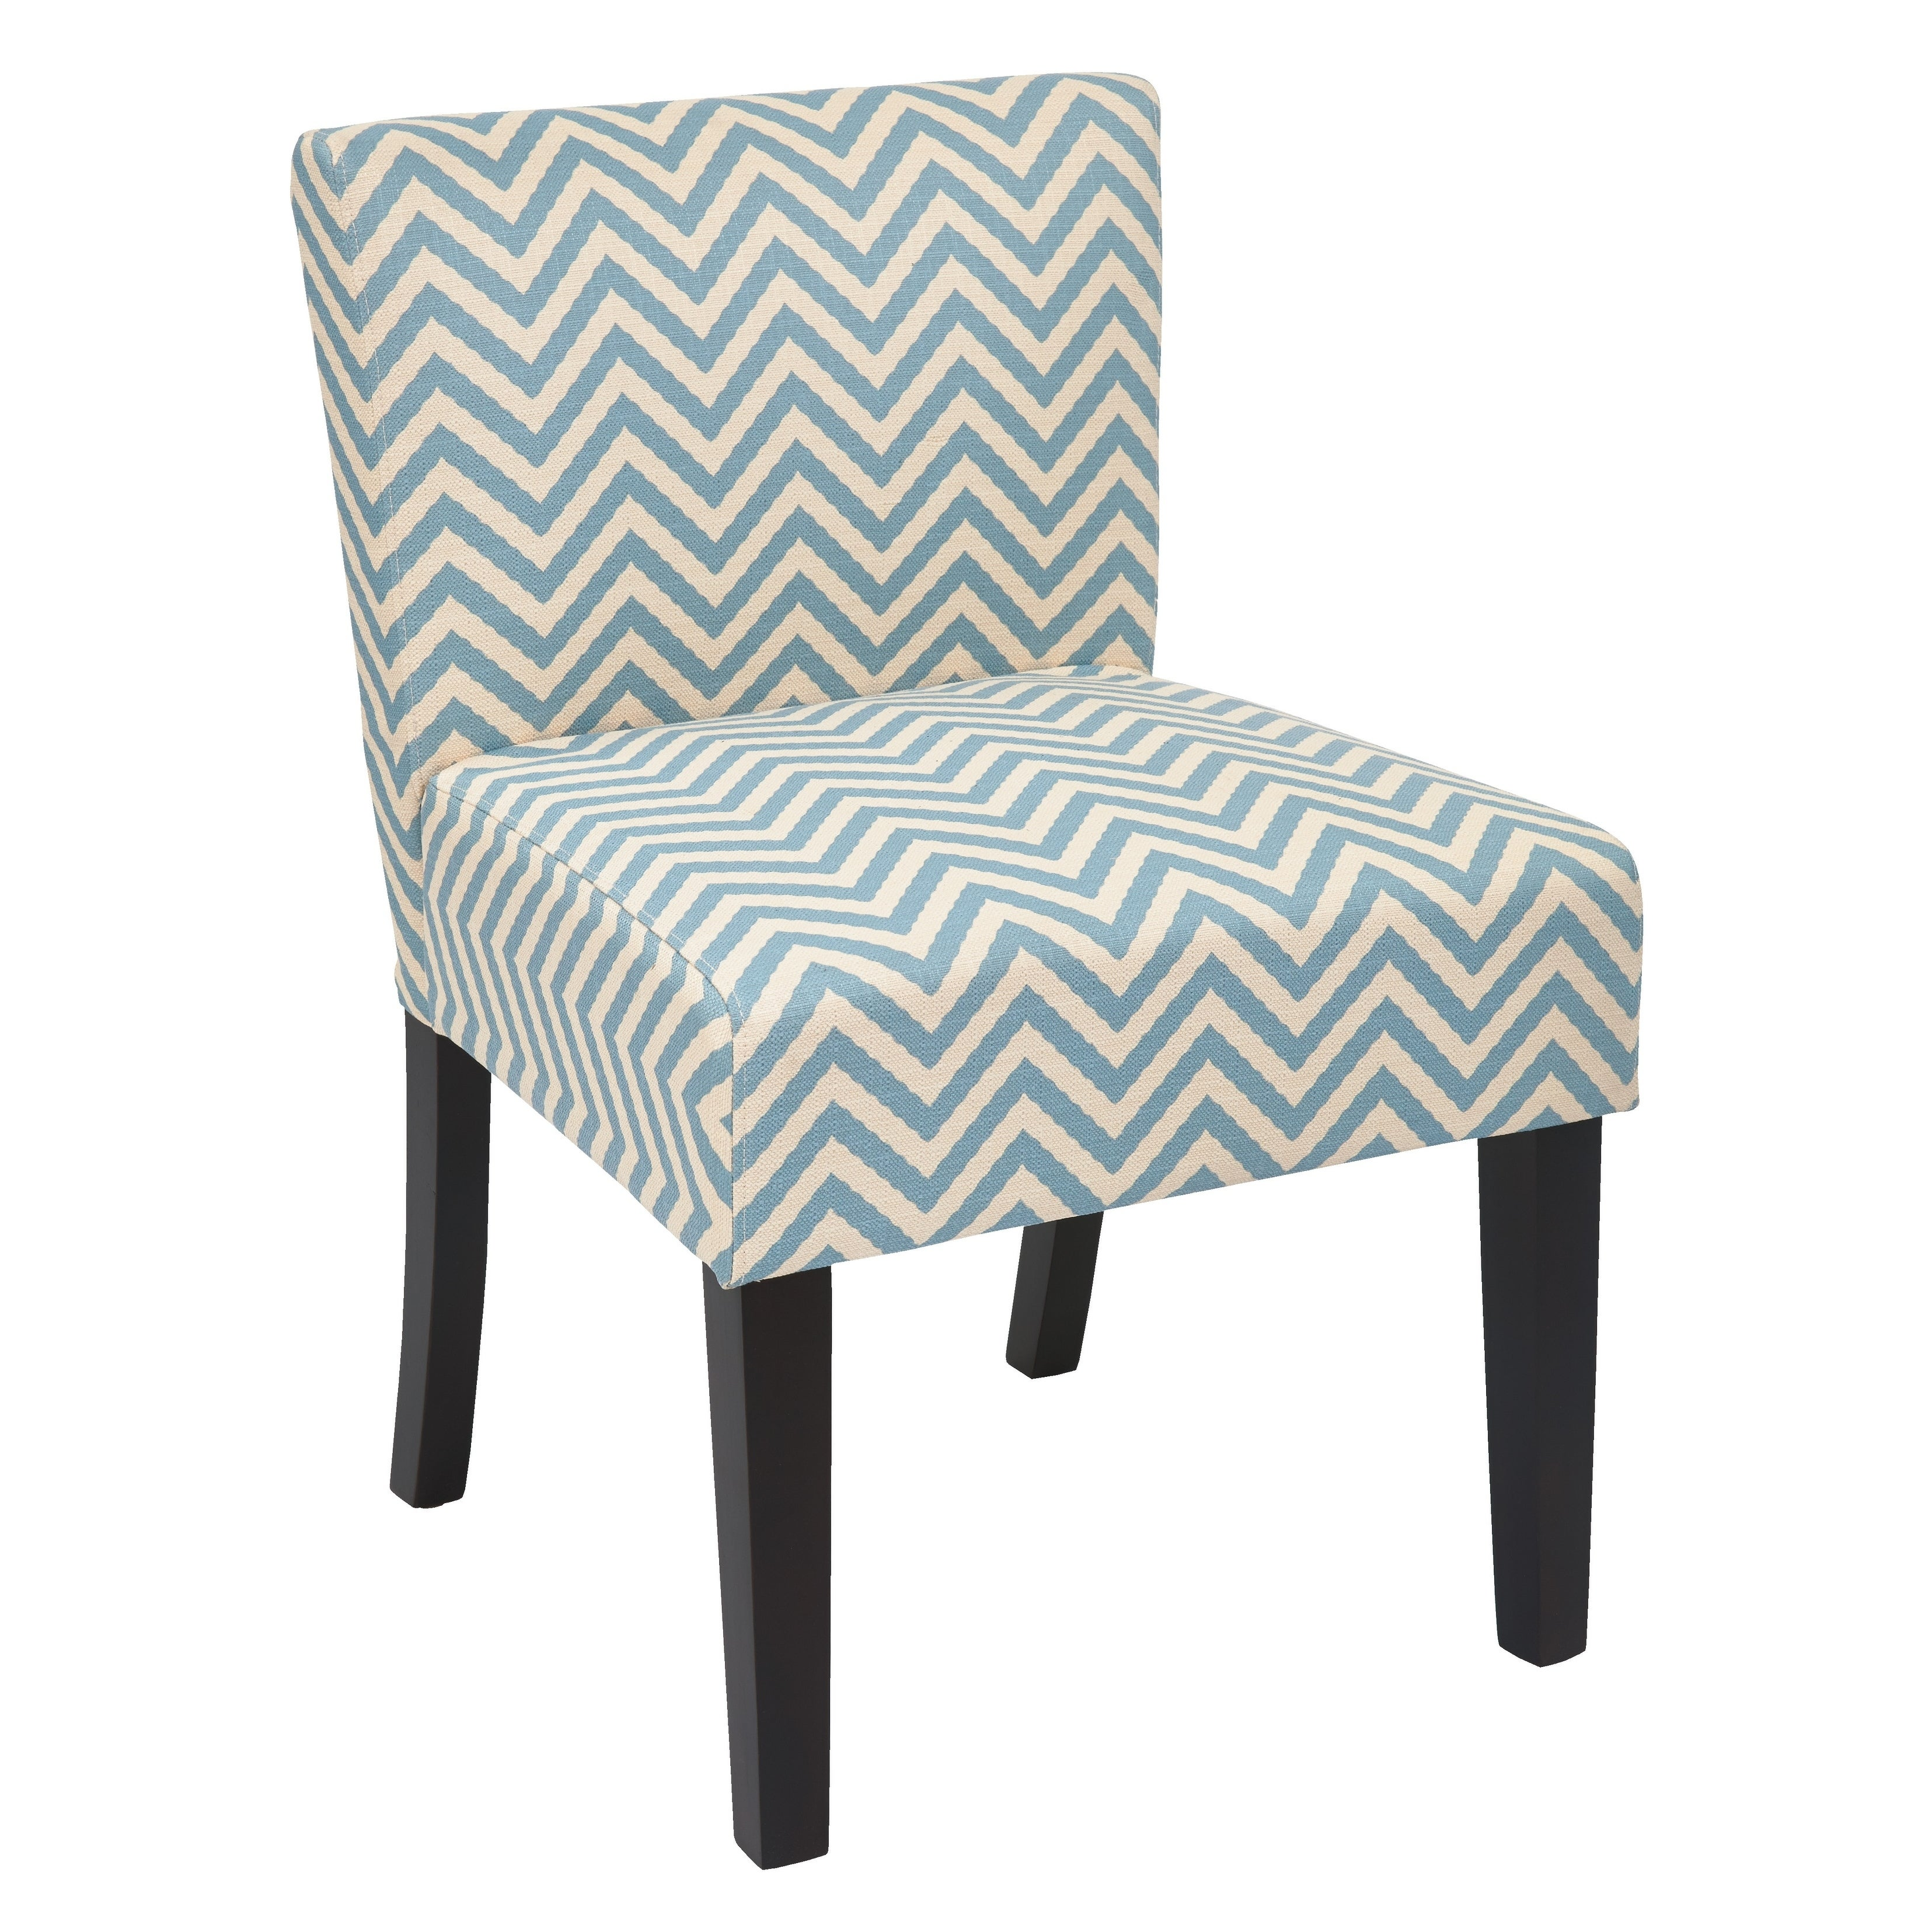 Prime Osp Home Furnishings Mist Blue Chevron Accent Chair Theyellowbook Wood Chair Design Ideas Theyellowbookinfo